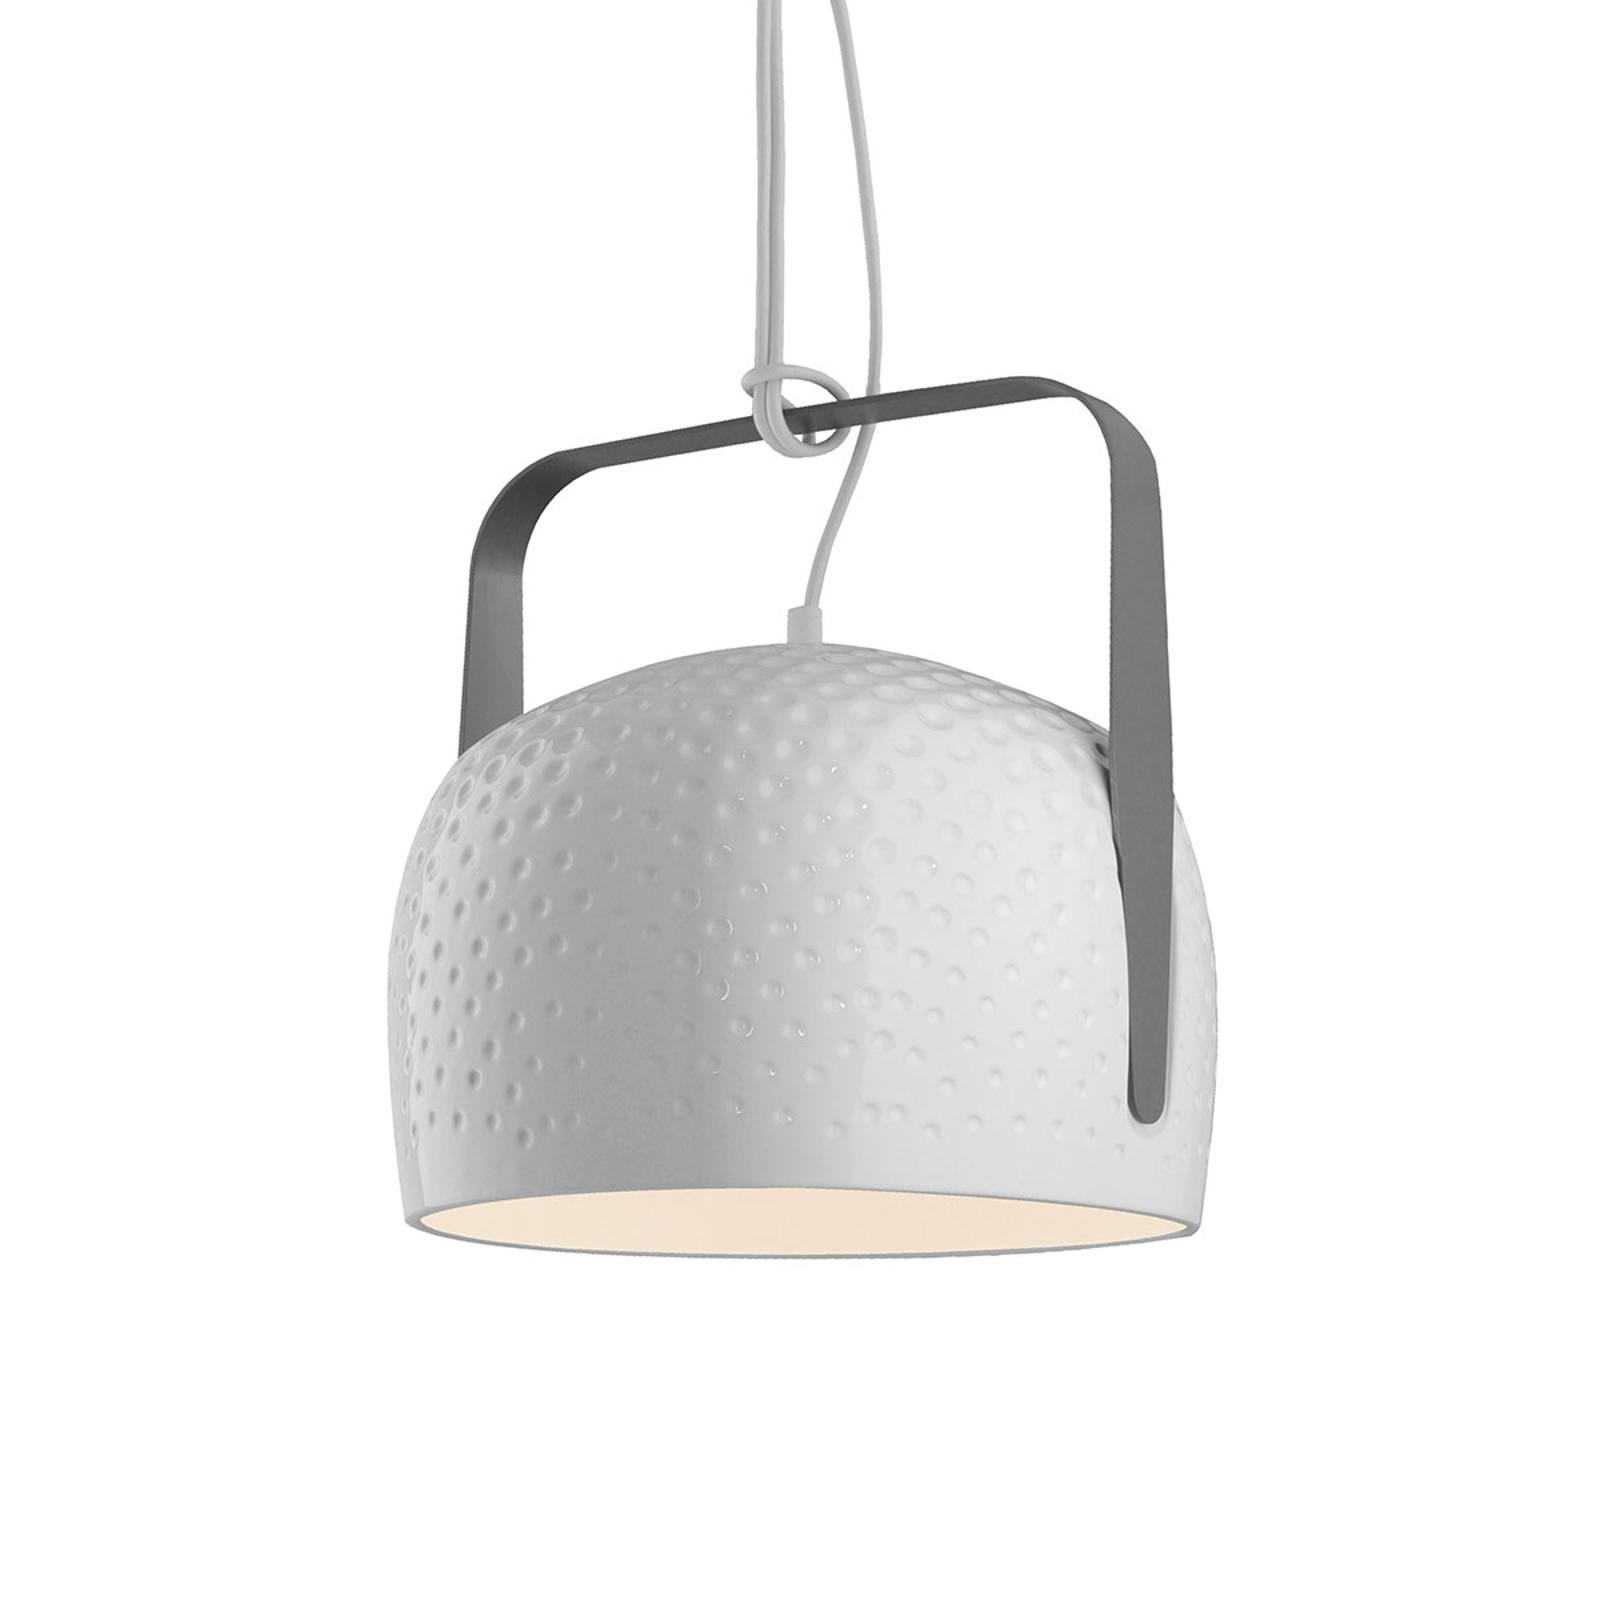 Karman Bag - biała lampa wisząca 21 cm struktura